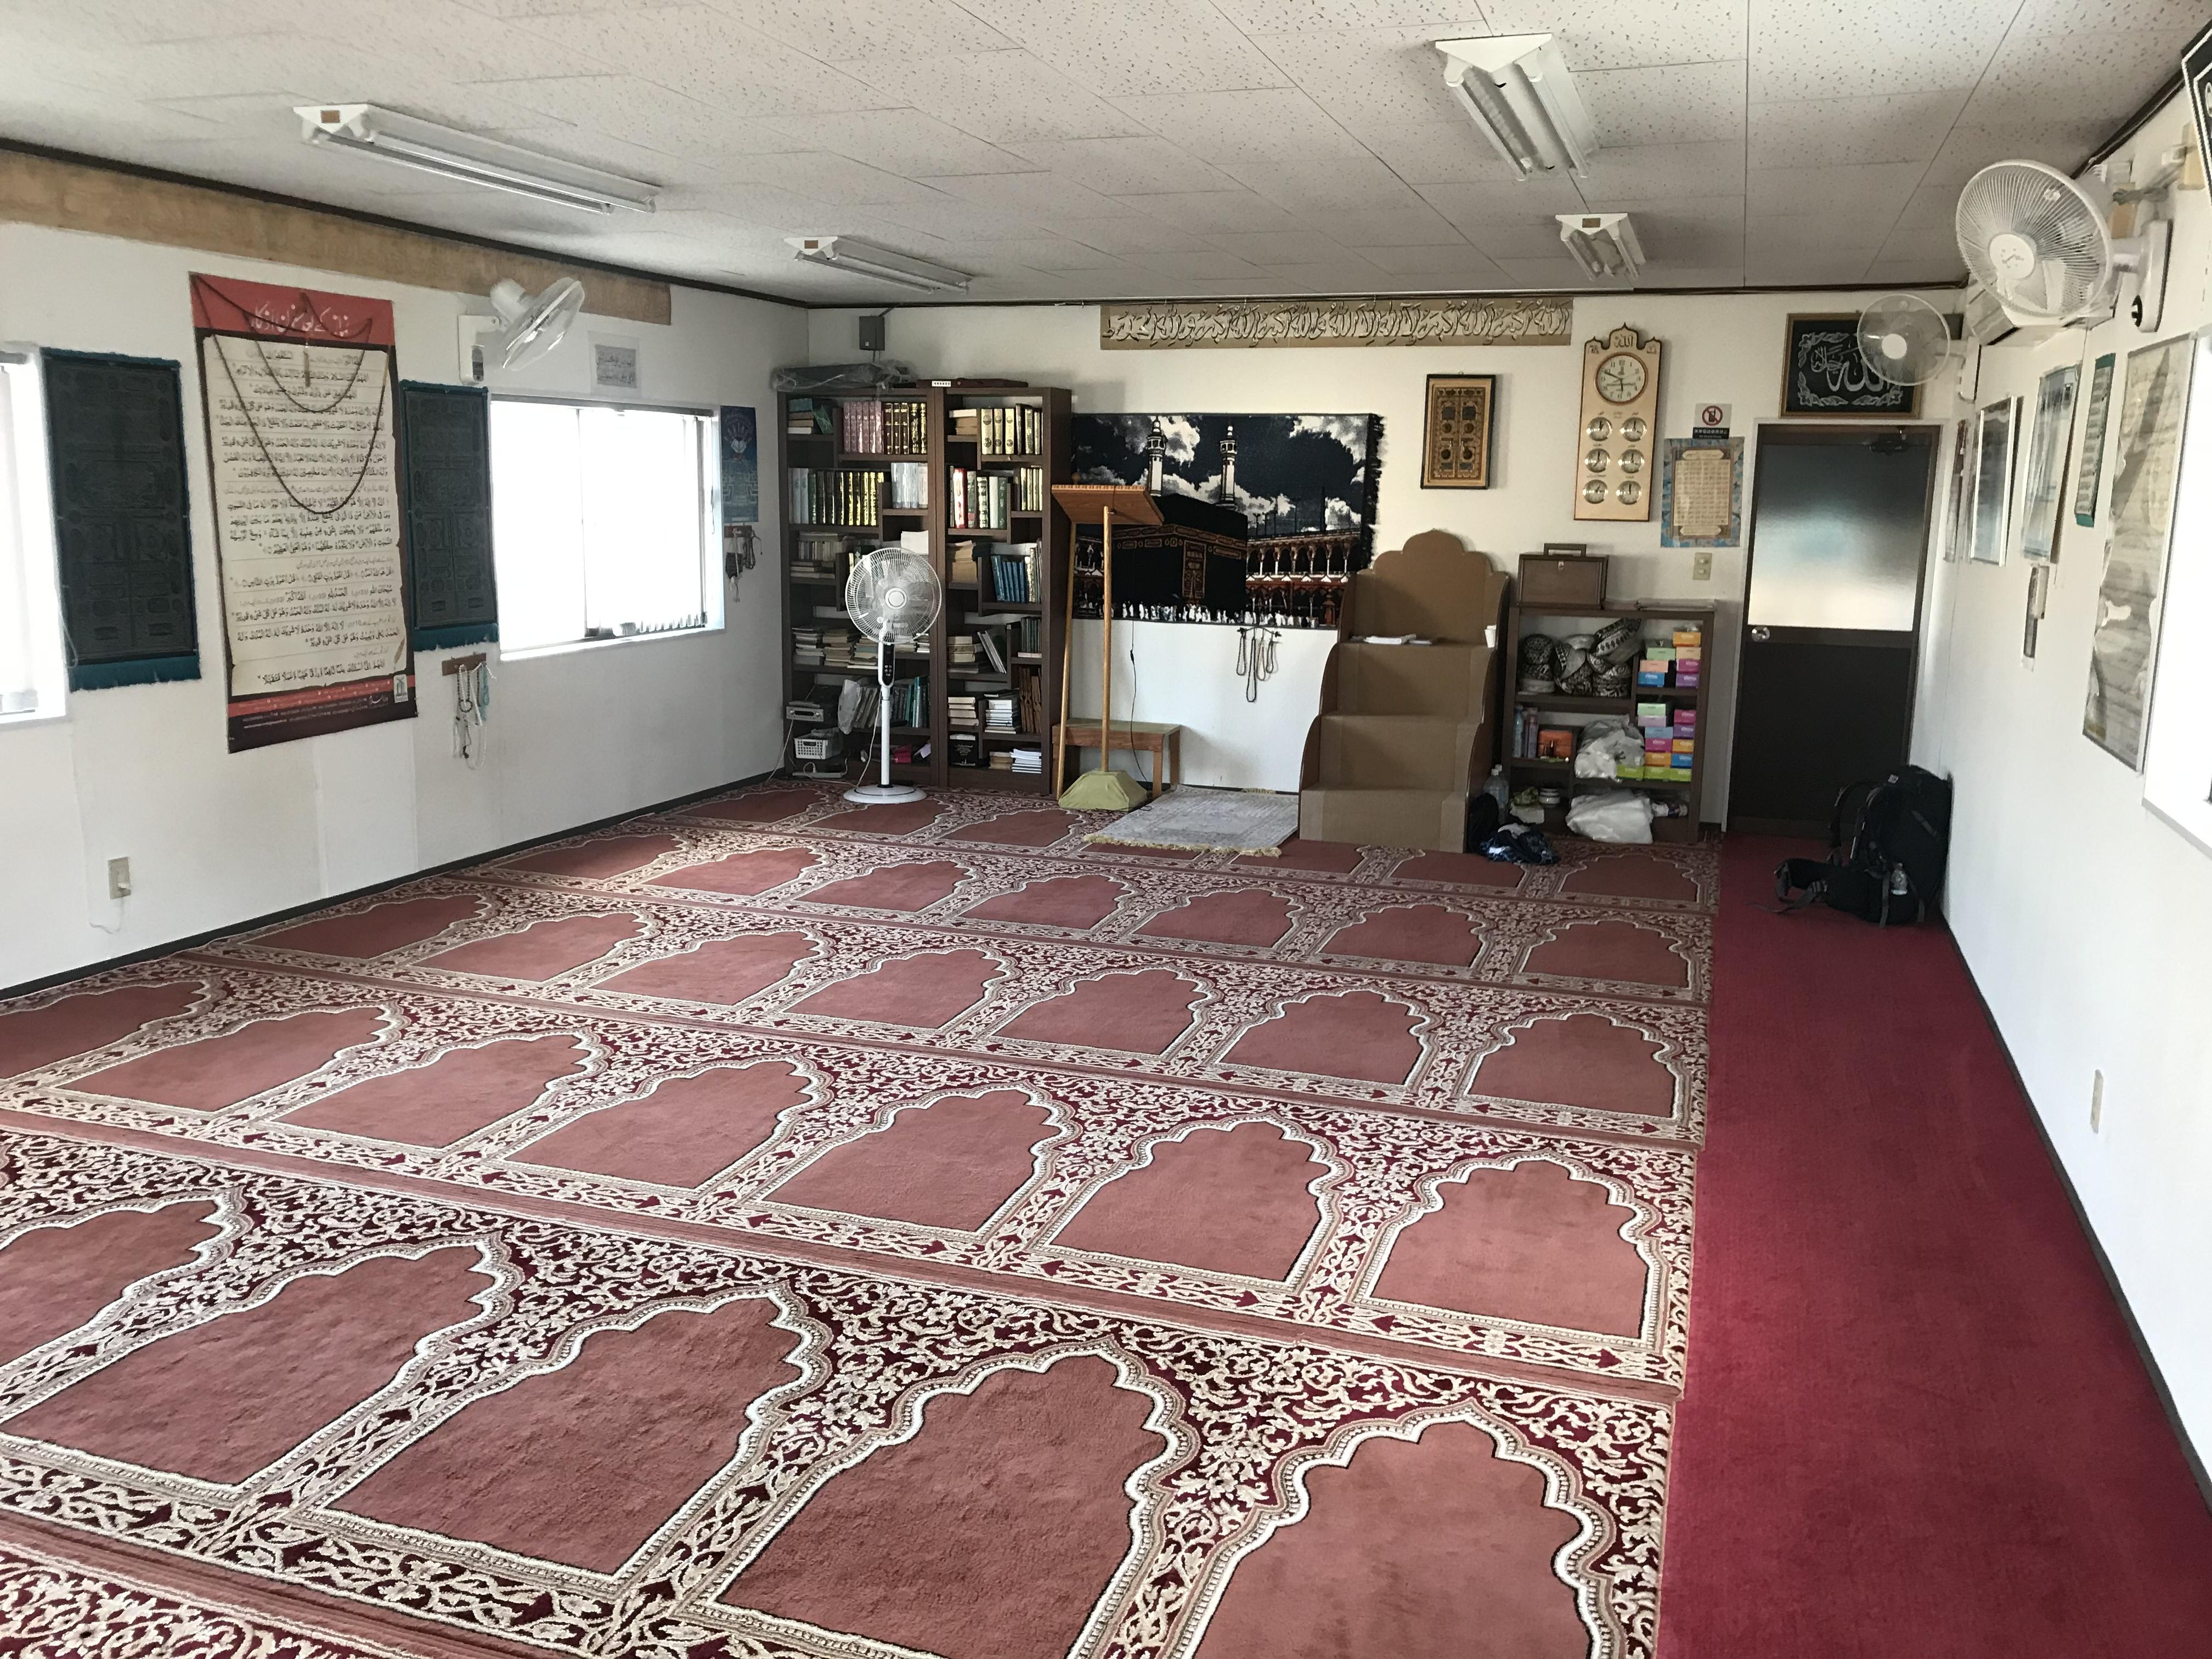 "Masjid in Japan ""Masjid FAROOQ-E-AZAM"" 〜Information of mosque & prayer room〜"